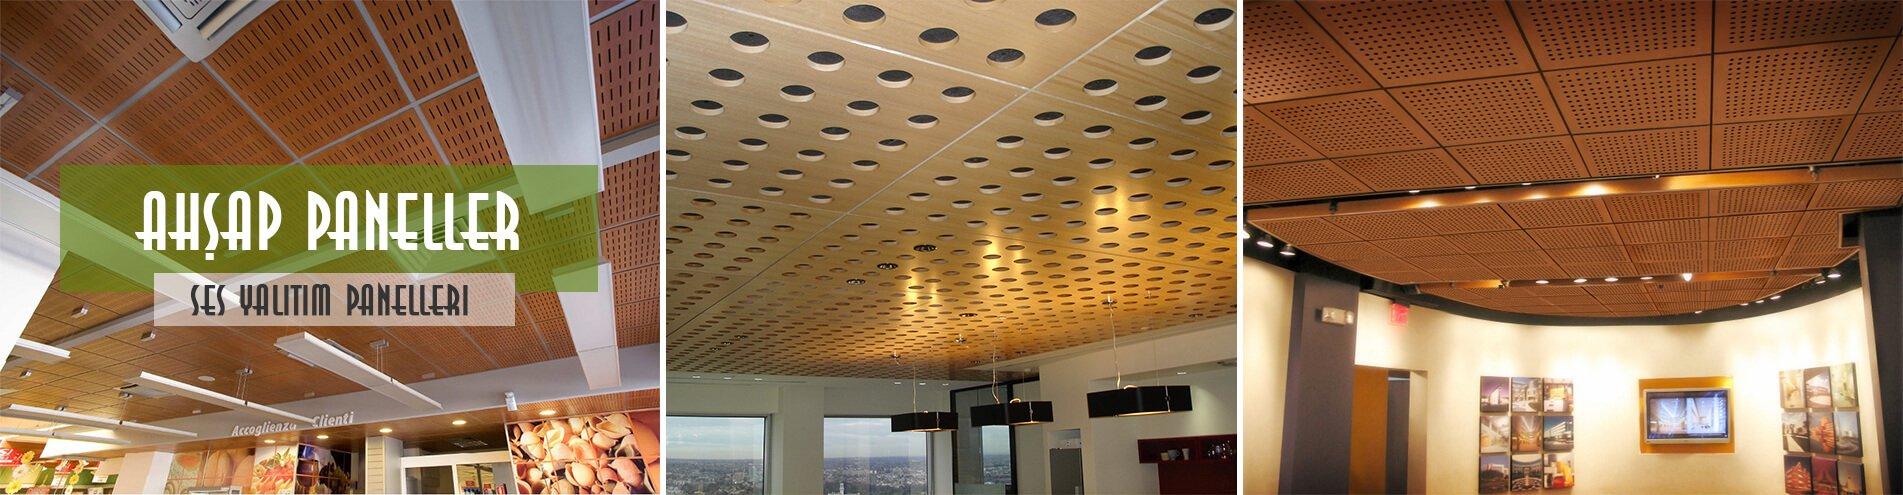 Akustik ahşap kaplama ses yalıtım panelleri